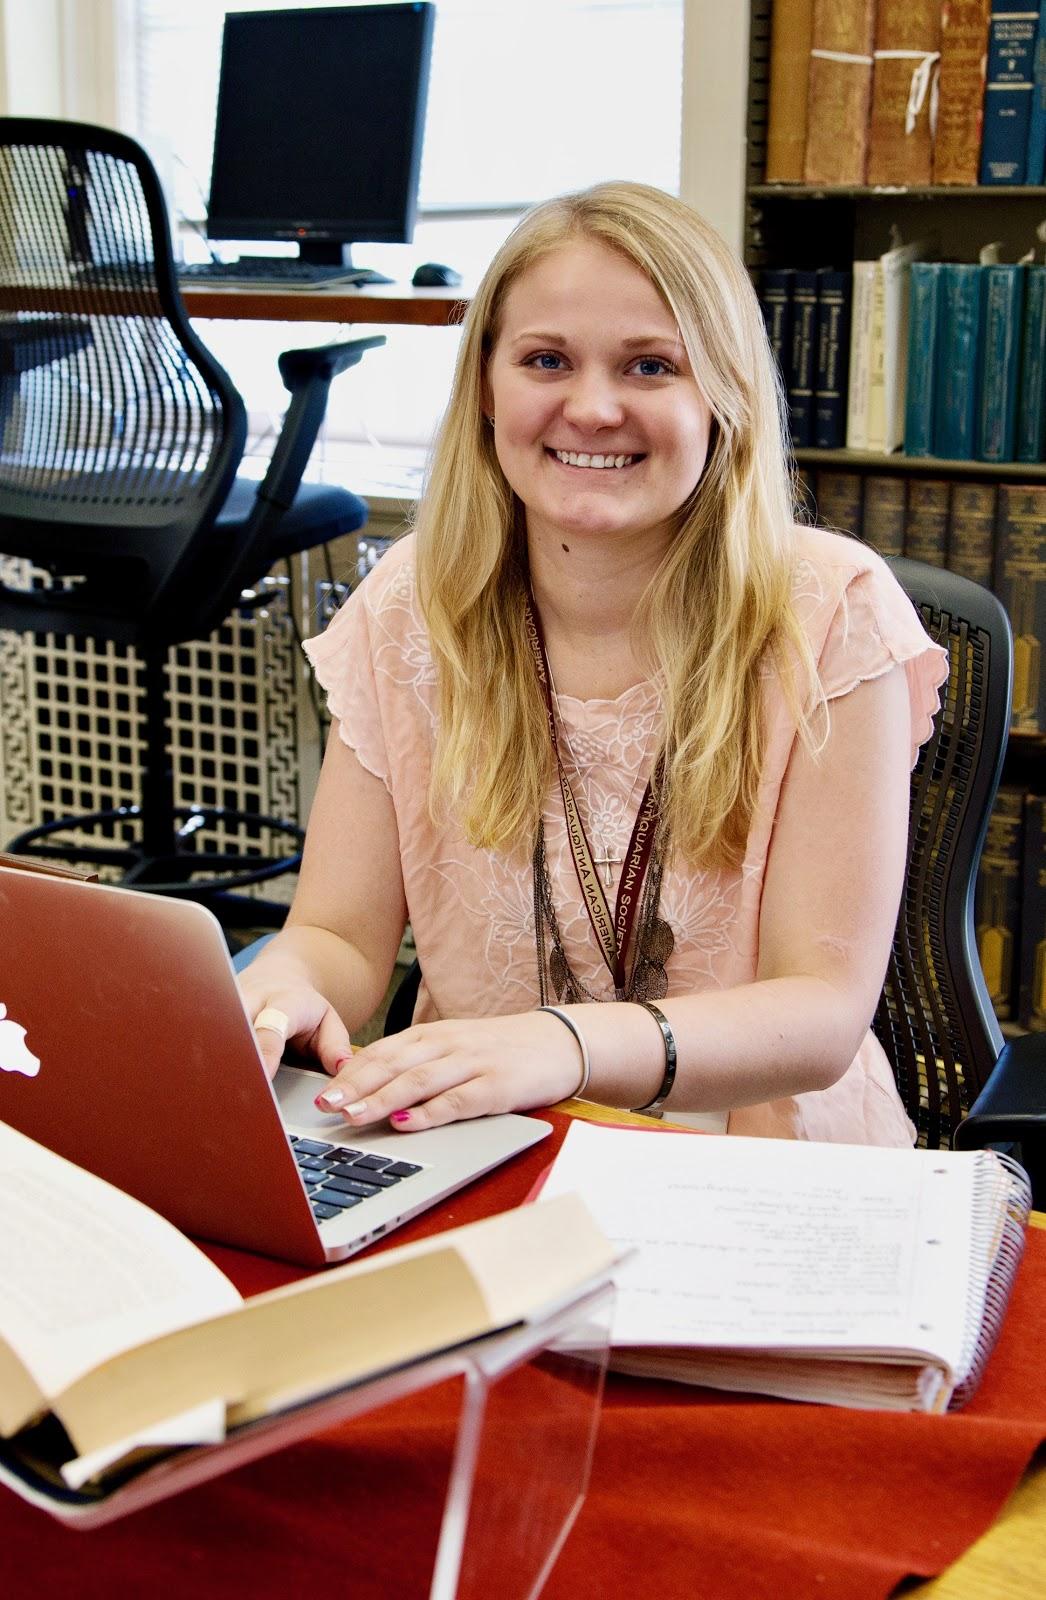 Samantha Cook, University of Wyoming